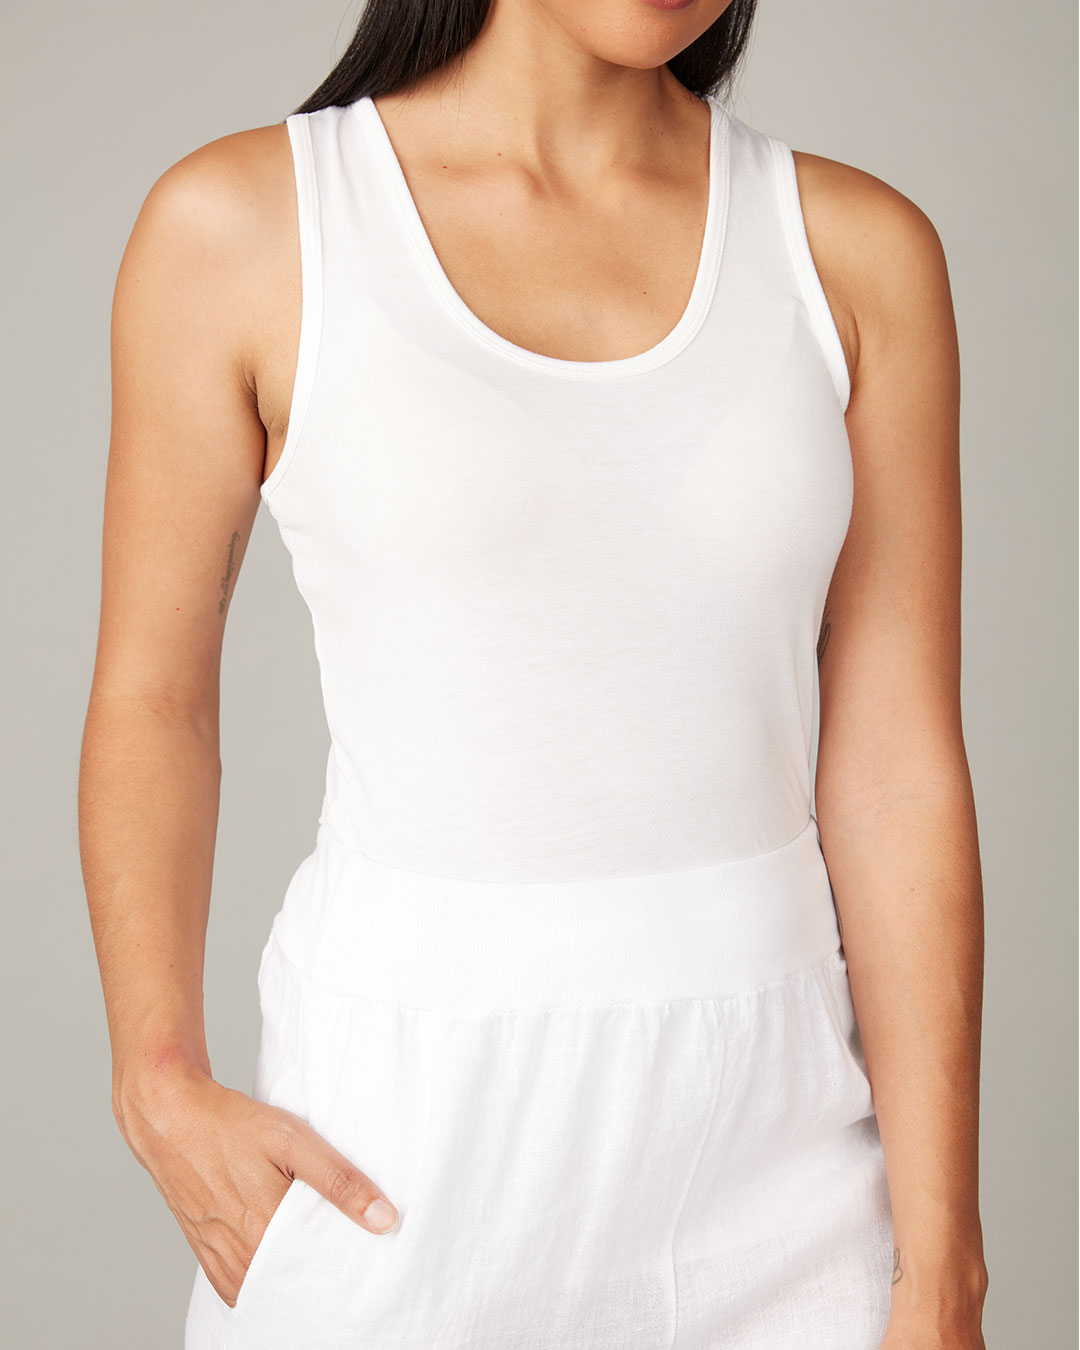 pistache-clothing-second-skin-tank-white-dianes-lingerie-vancouver-1080x1080